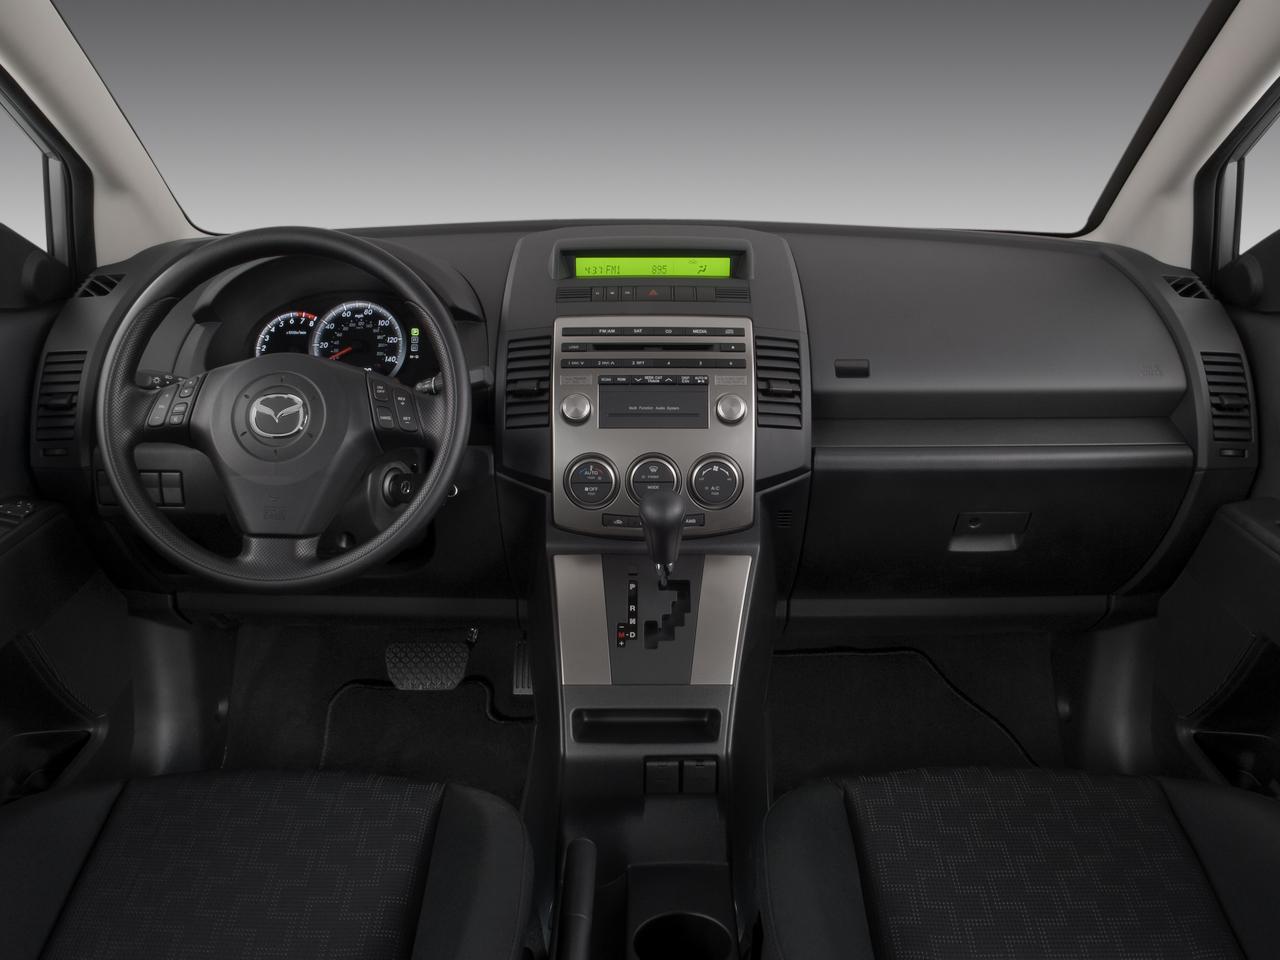 https://st.automobilemag.com/uploads/sites/10/2015/11/2008-mazda-mazda5-sport-wagon-dashboard.png